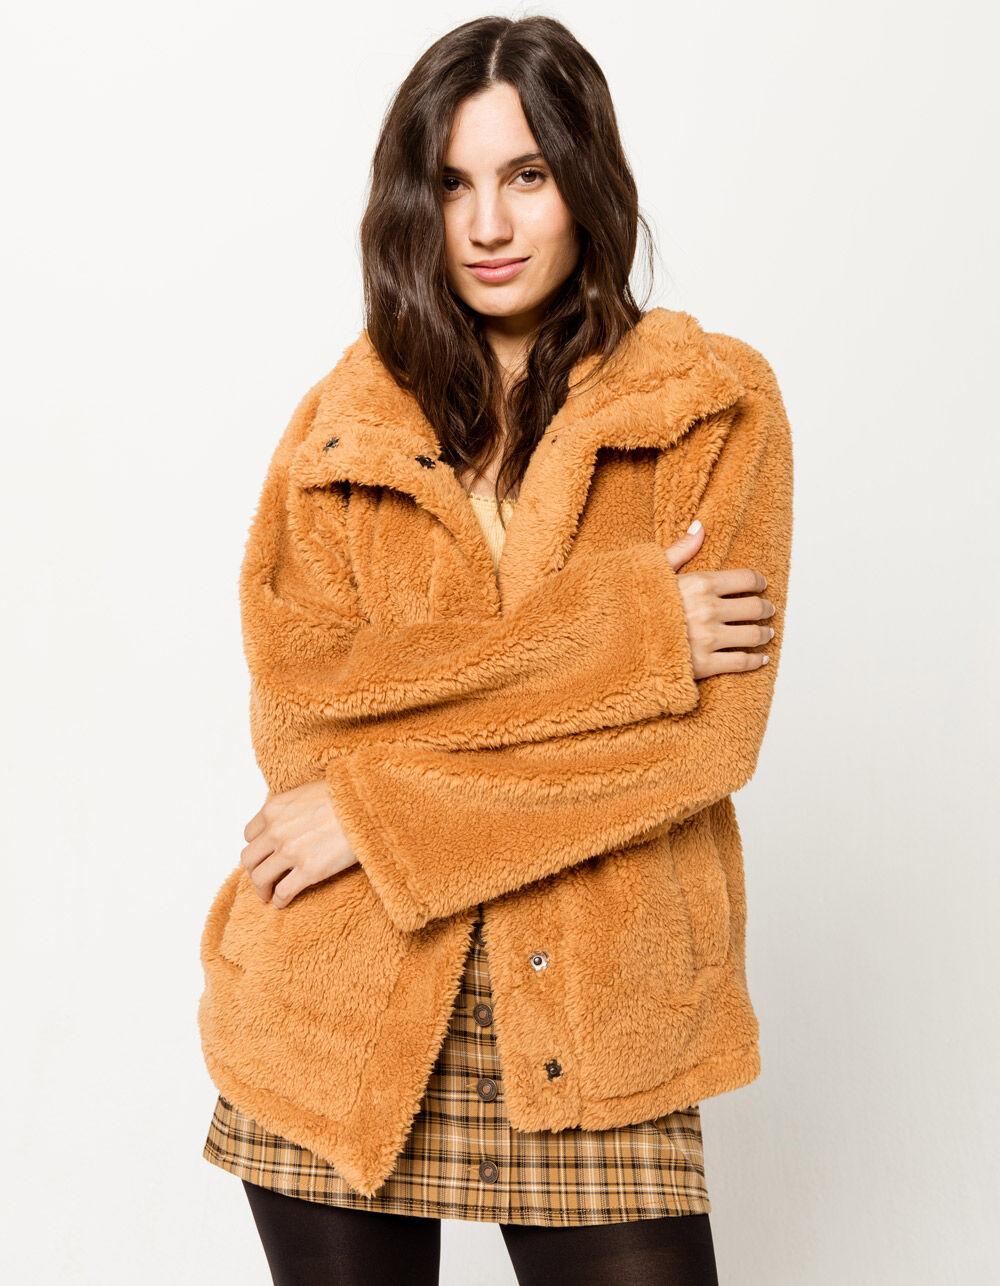 BILLABONG Cozy Days Sherpa Caramel Jacket